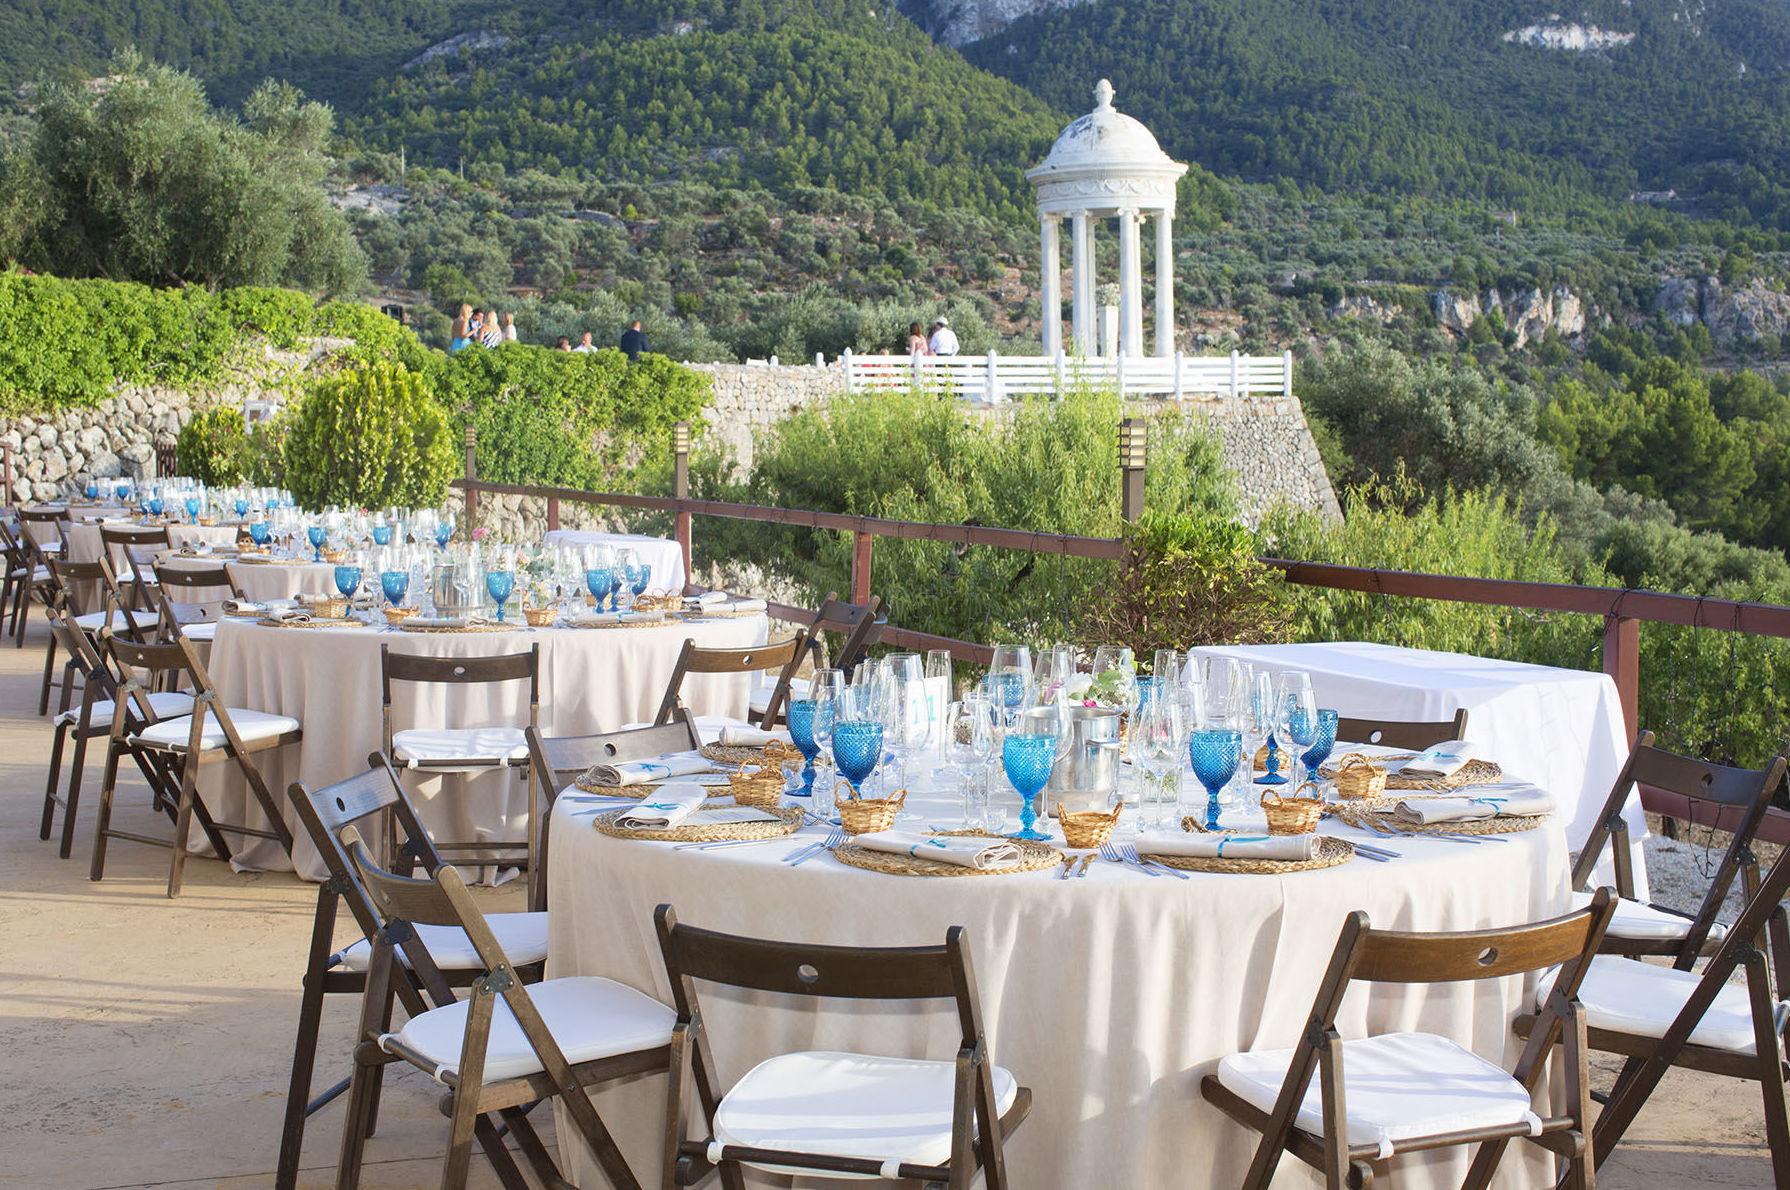 Catering para eventos especiales: Servicios de Finca Catering Mallorca